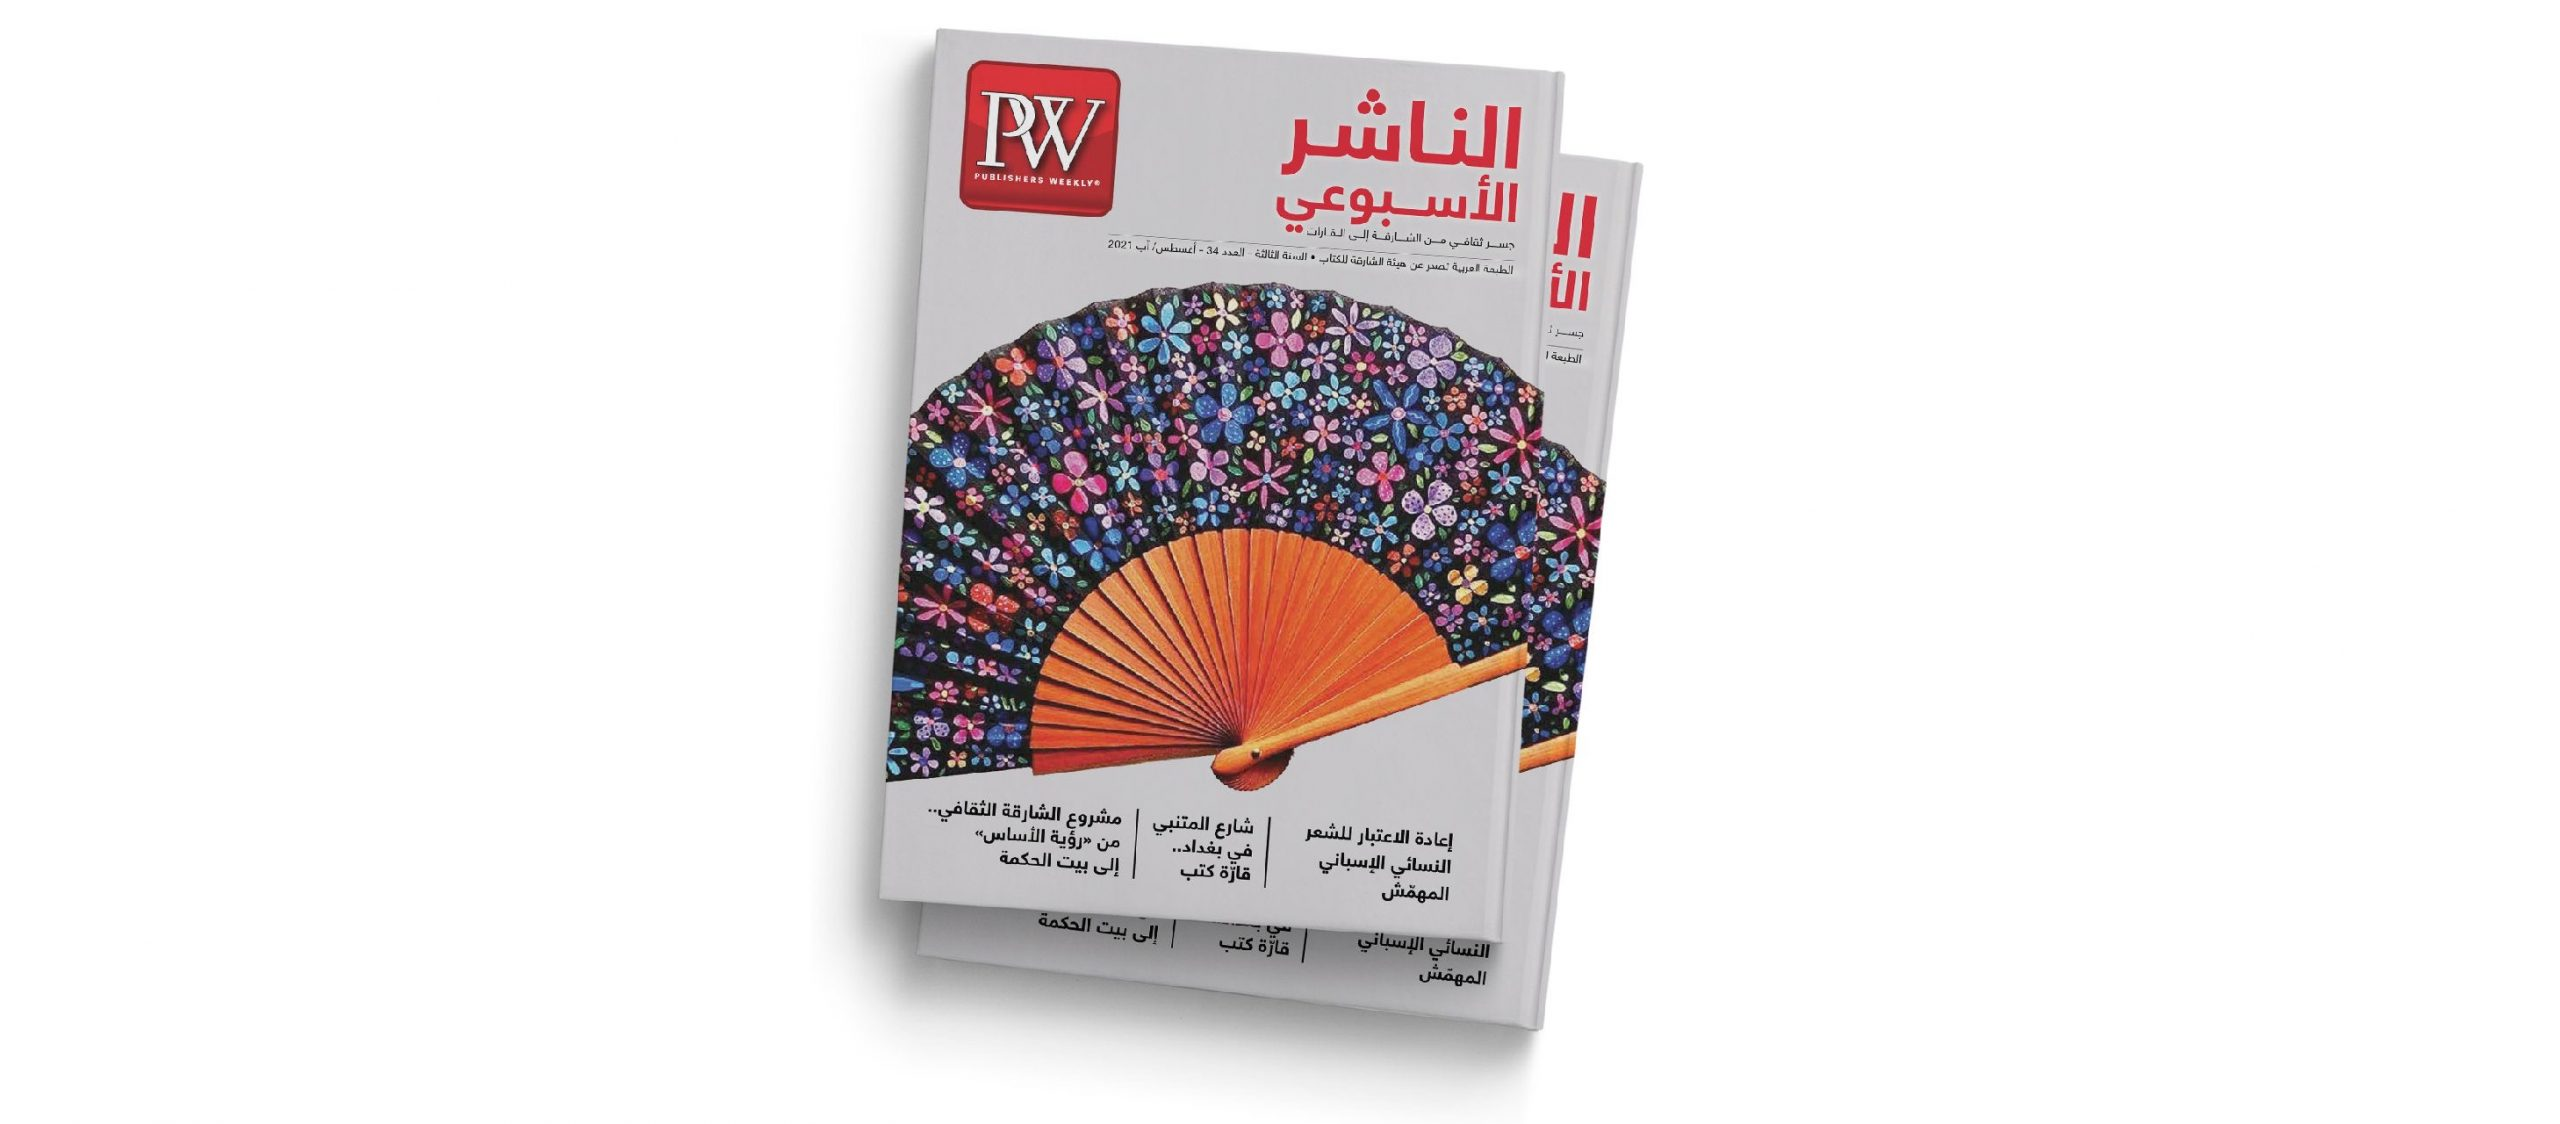 "Read more about the article ""الناشر الأسبوعي"" تتناول ظاهرة تهميش الشاعرات الإسبانيات"